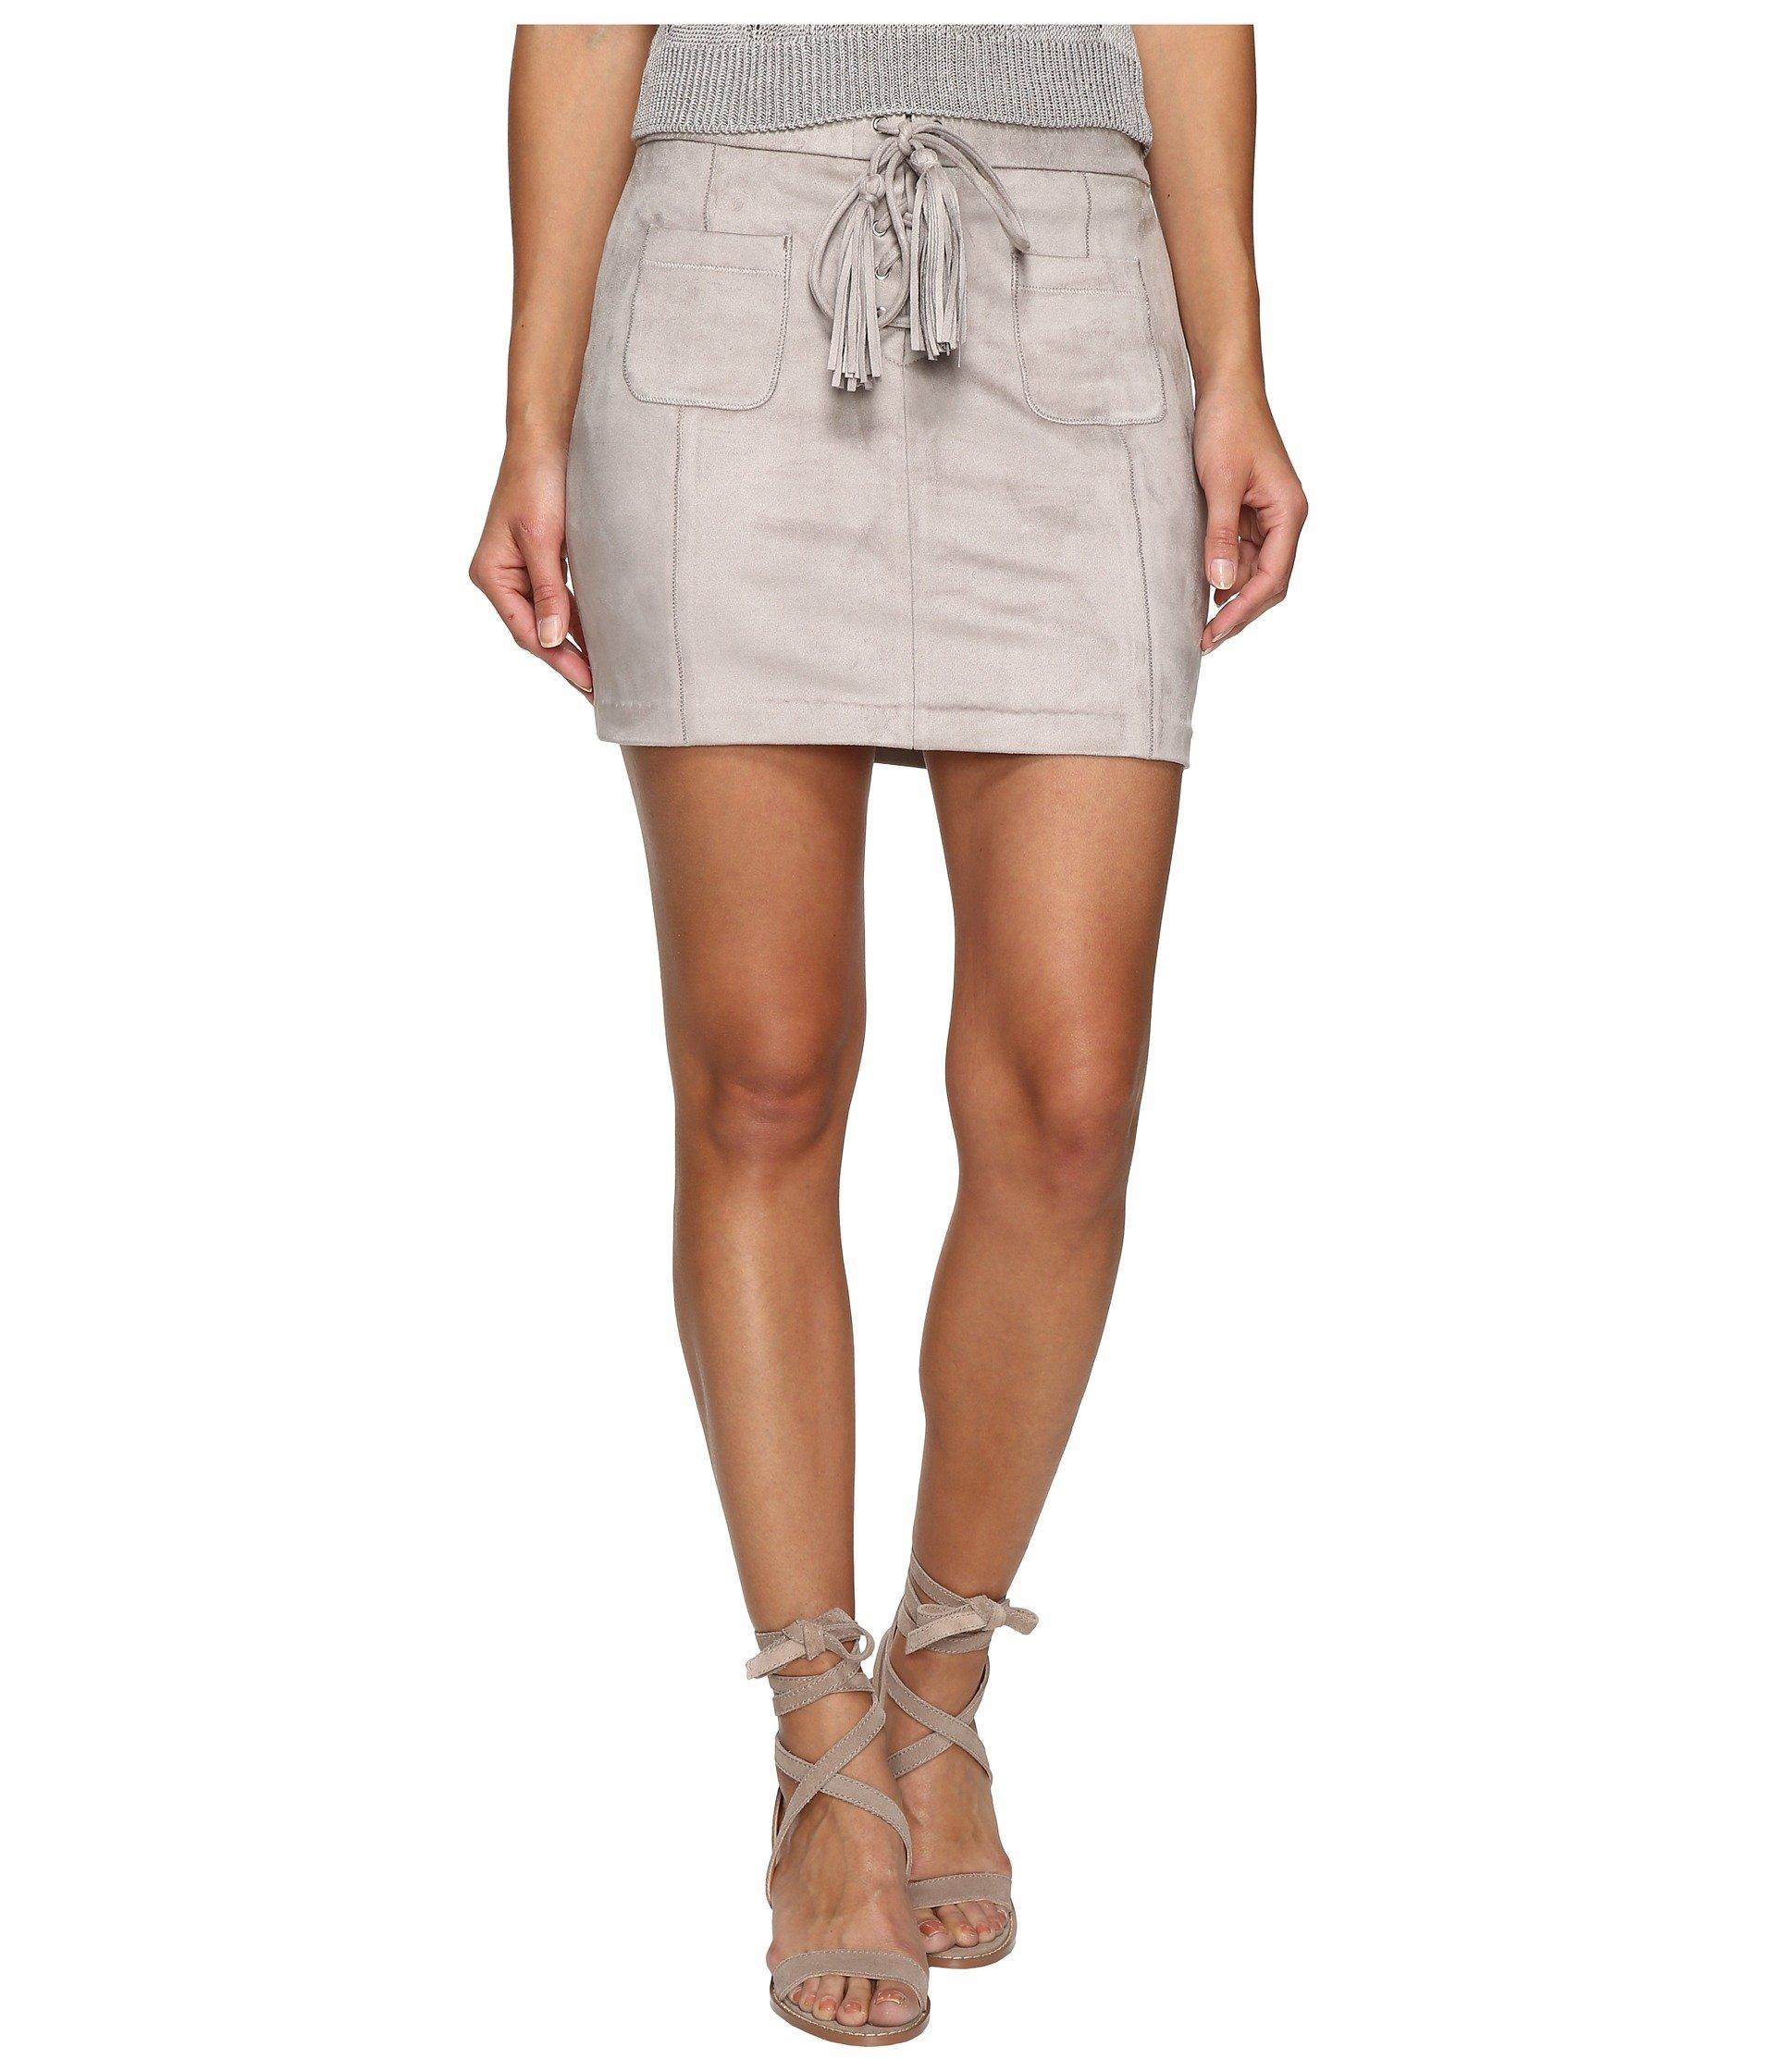 Falda para Mujer Dolce Vita Madden Skirt  + Dolce Vita en VeoyCompro.net